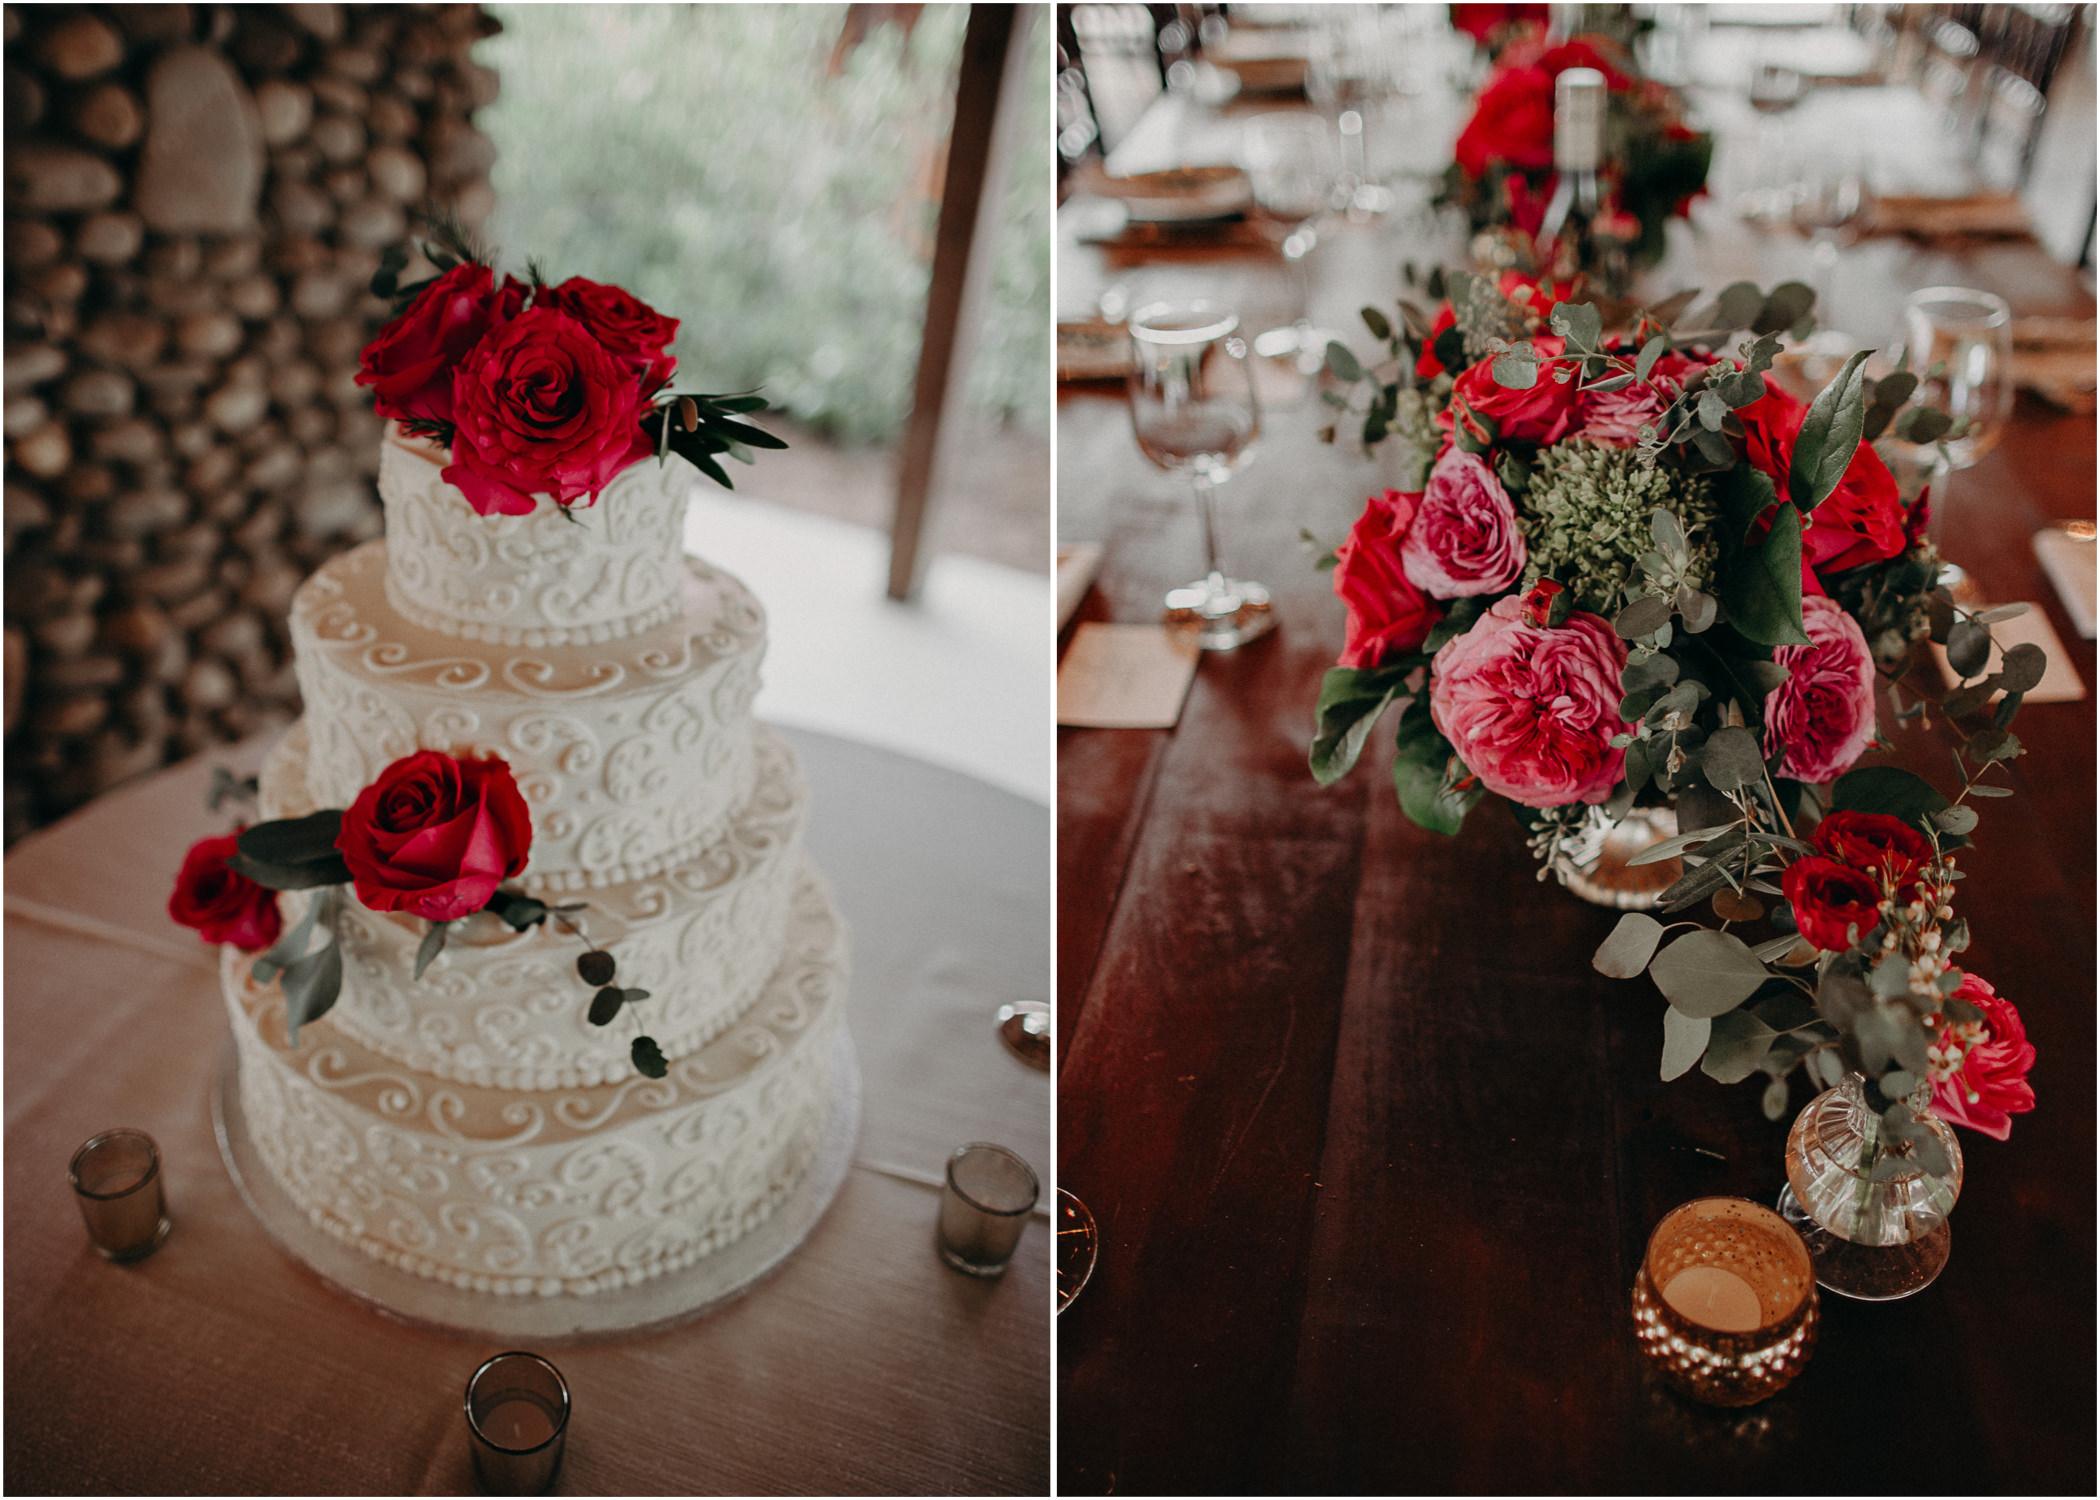 55 - details, cake, flowers, wedding dress, bridesmaids, bouquet - bride getting ready wedding seranbi farms atlanta .jpg